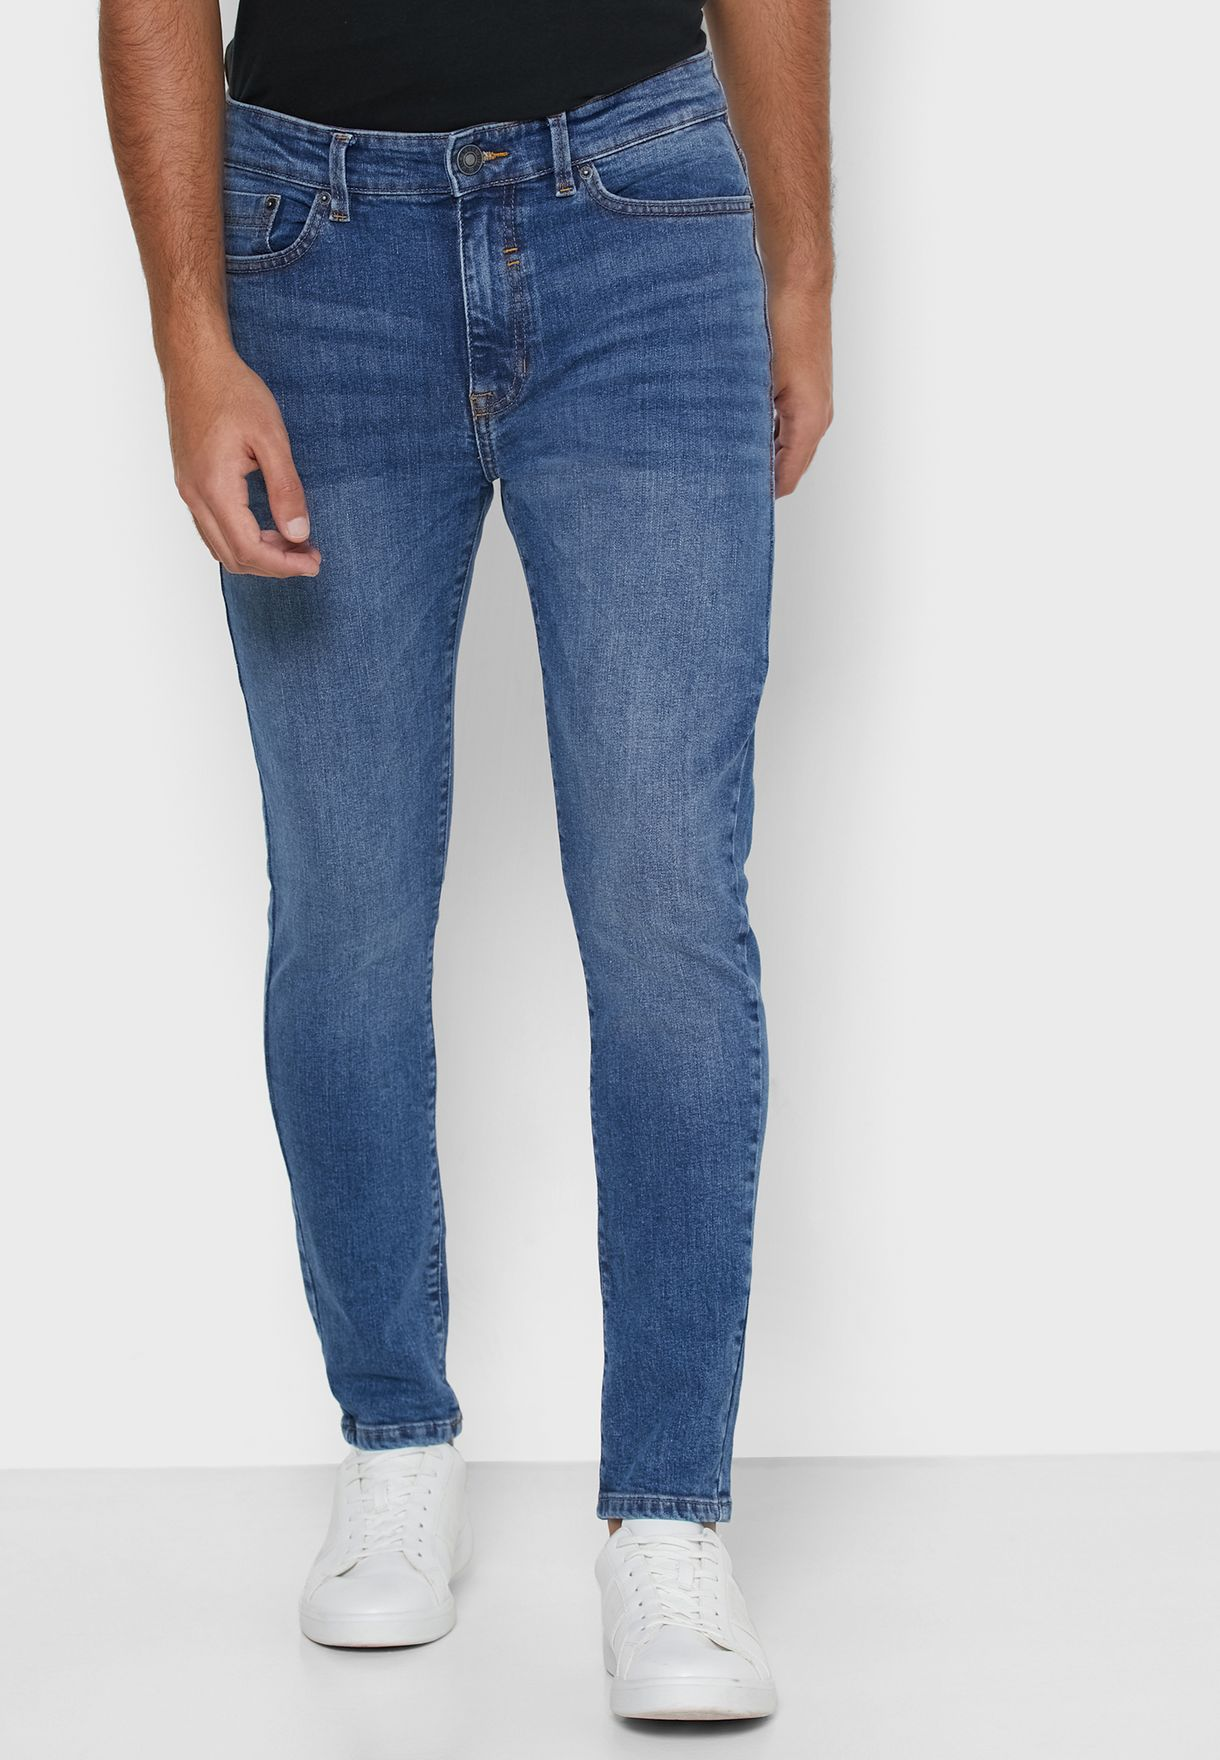 Simba Super Skinny Fit Jeans